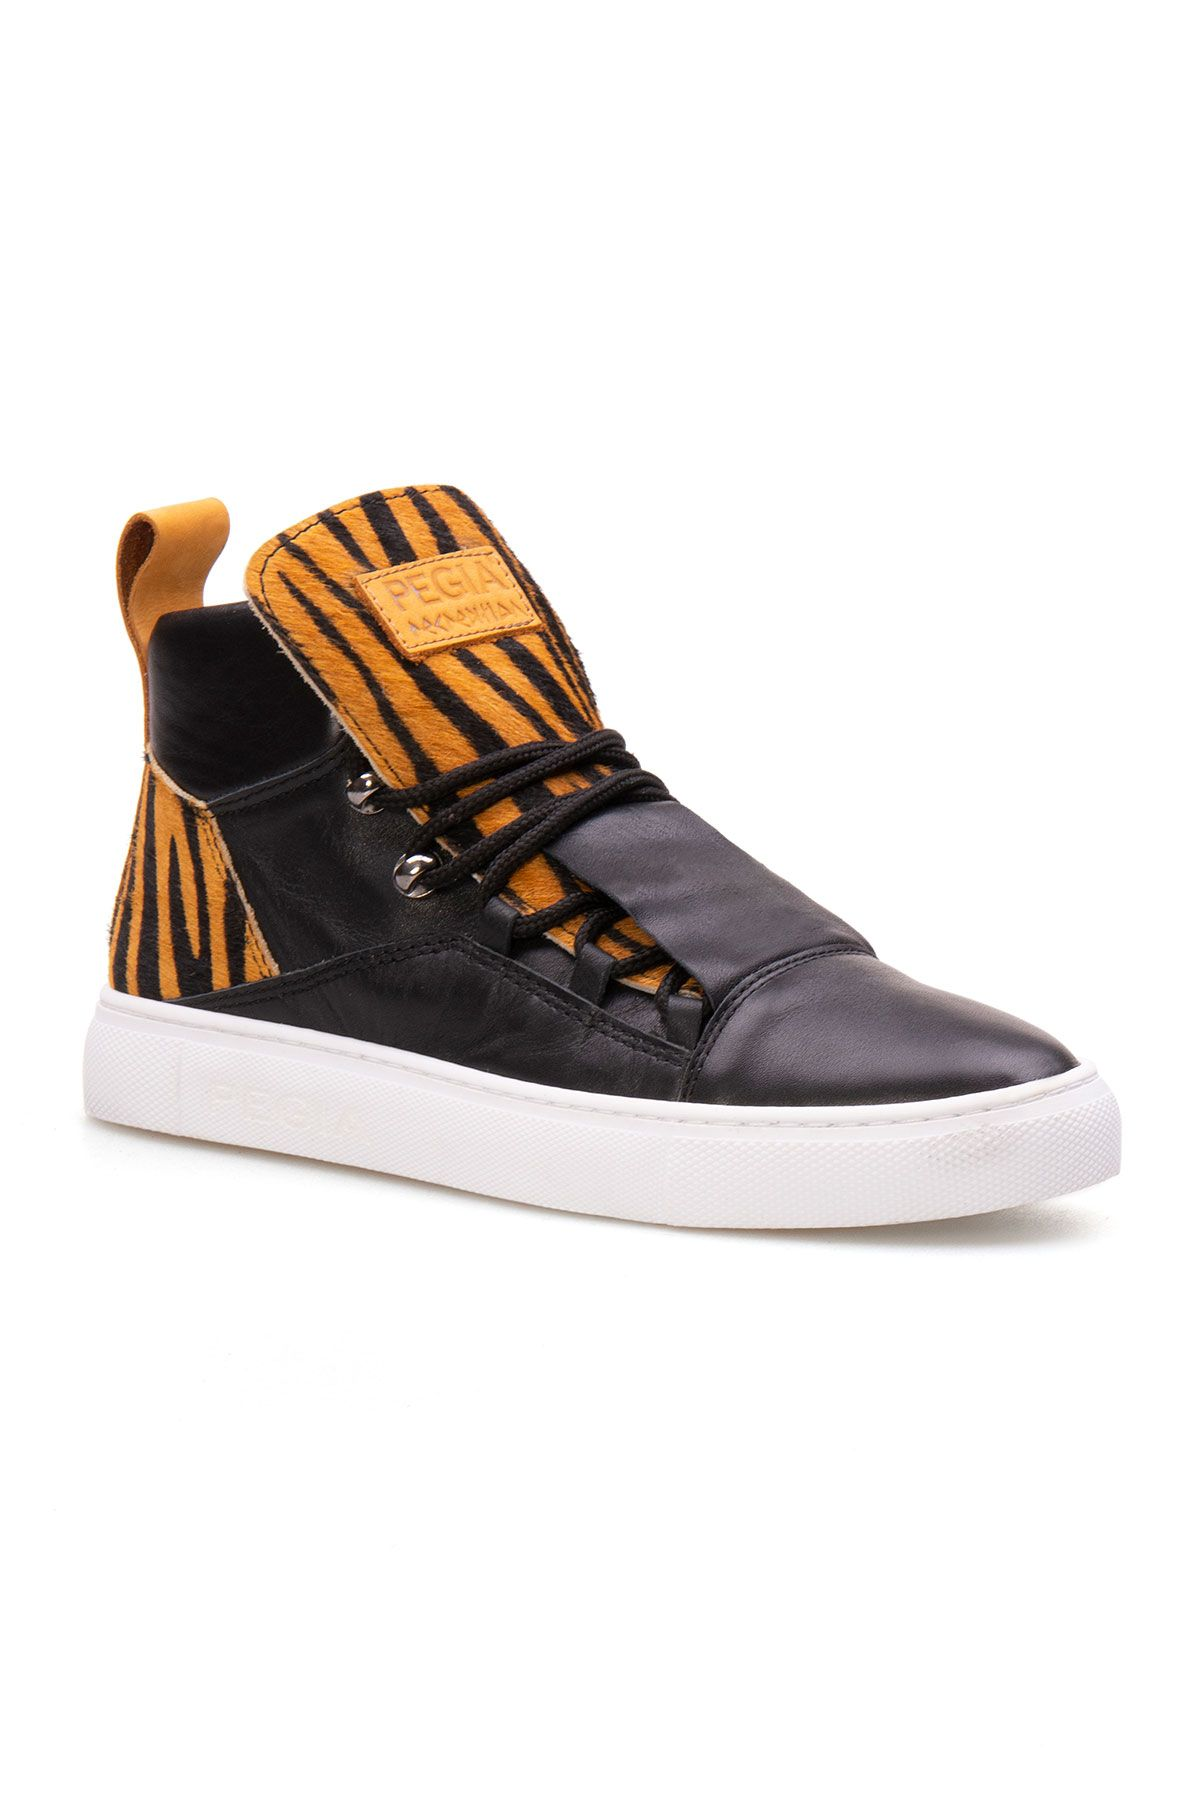 Pegia Genuine Leather Women's Sneaker LA1306 Yellow